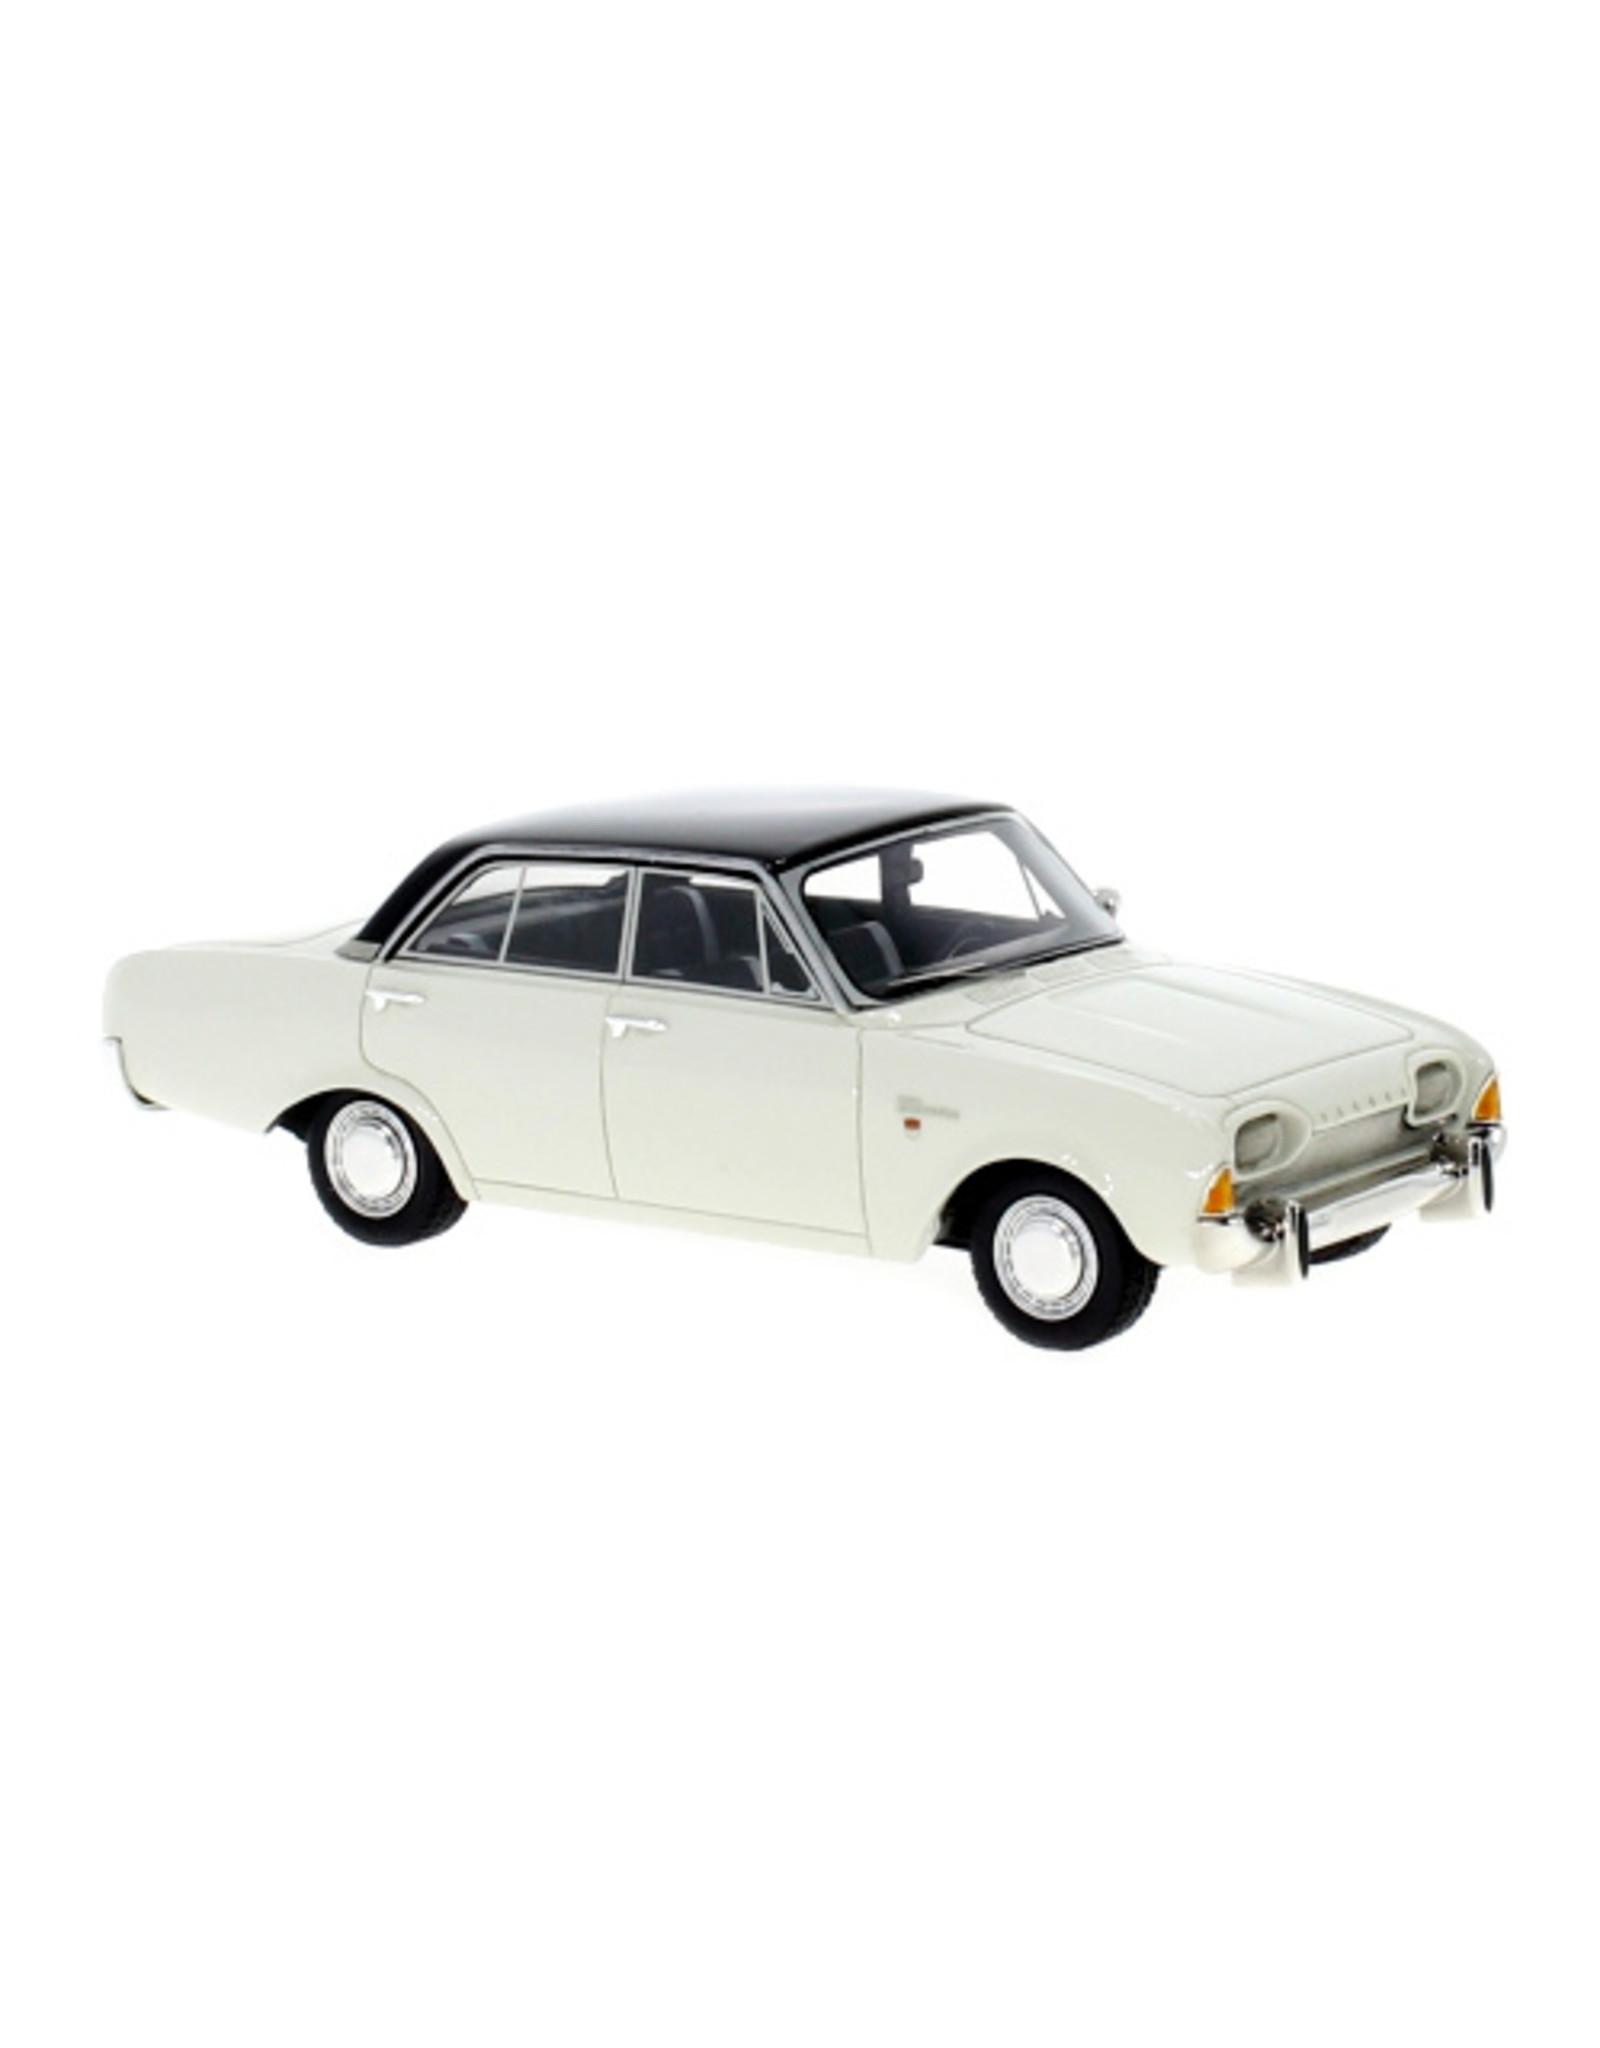 Ford Europe FORD TAUNUS 17m P3 4-door(white/black)1960